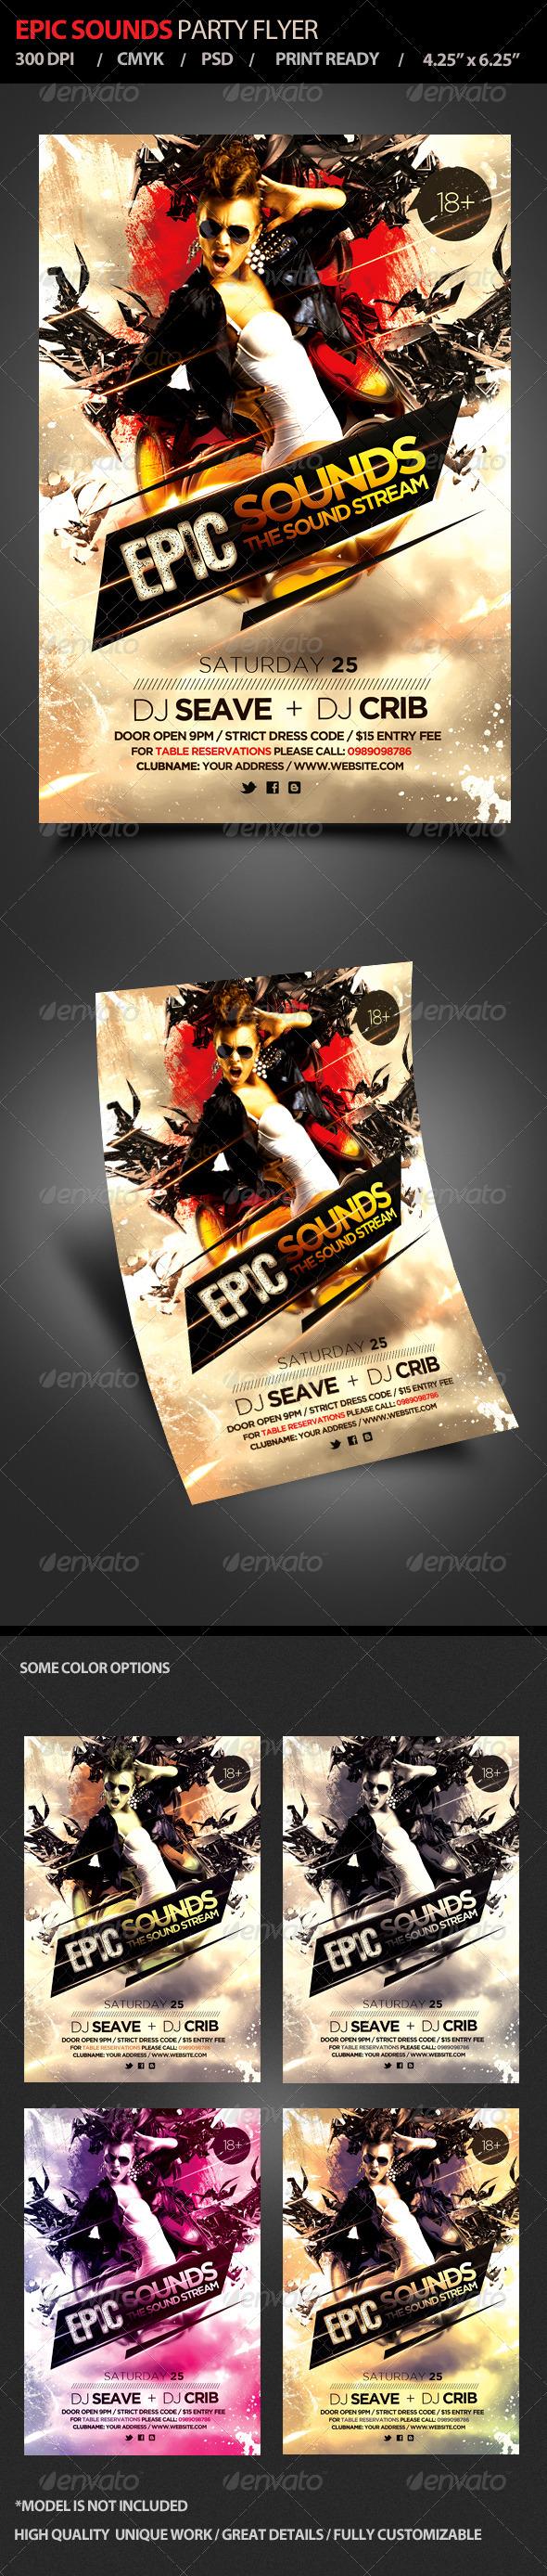 Epic Sounds Party Flyer - Flyers Print Templates